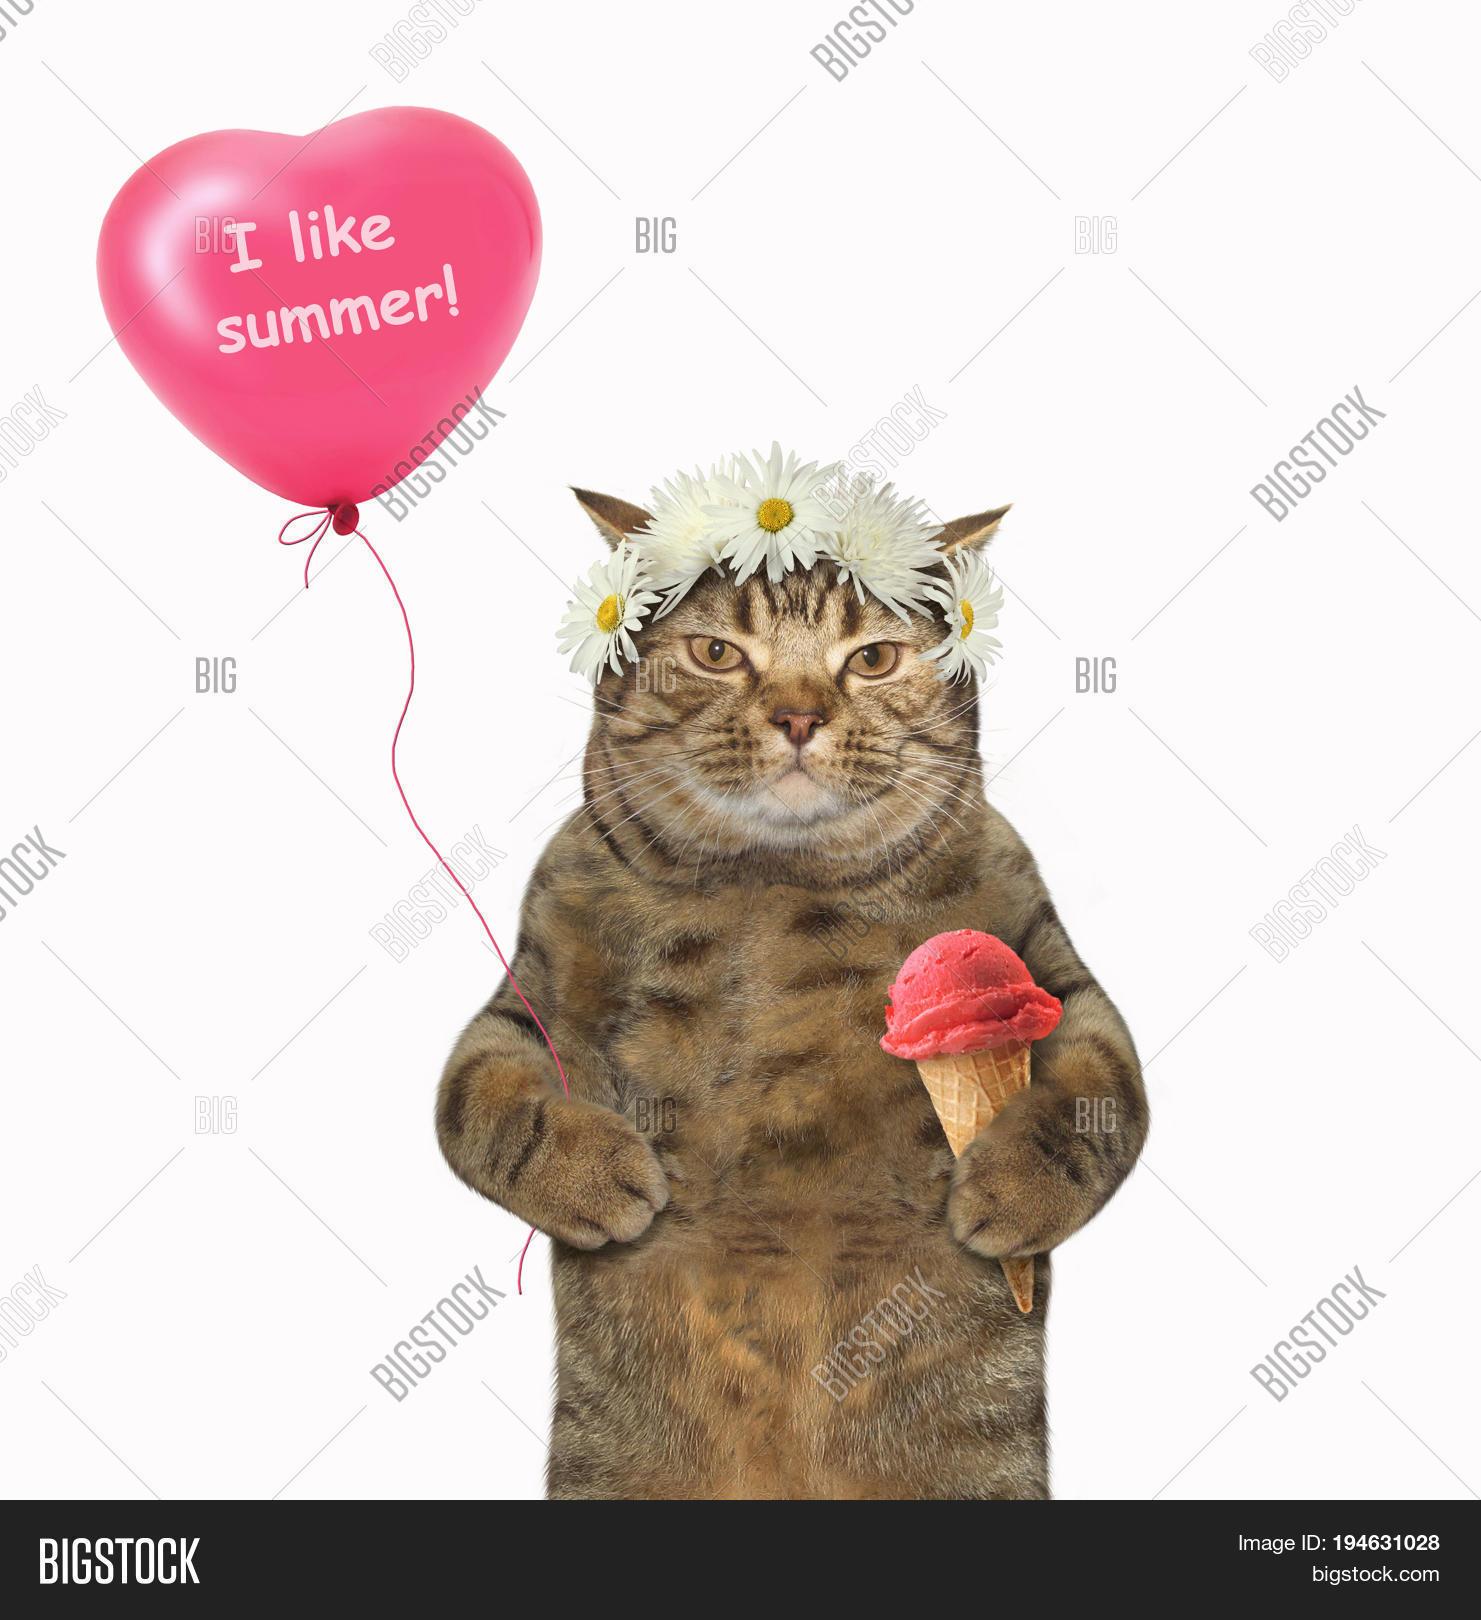 Cat Eats Ice Cream Image Photo Free Trial Bigstock